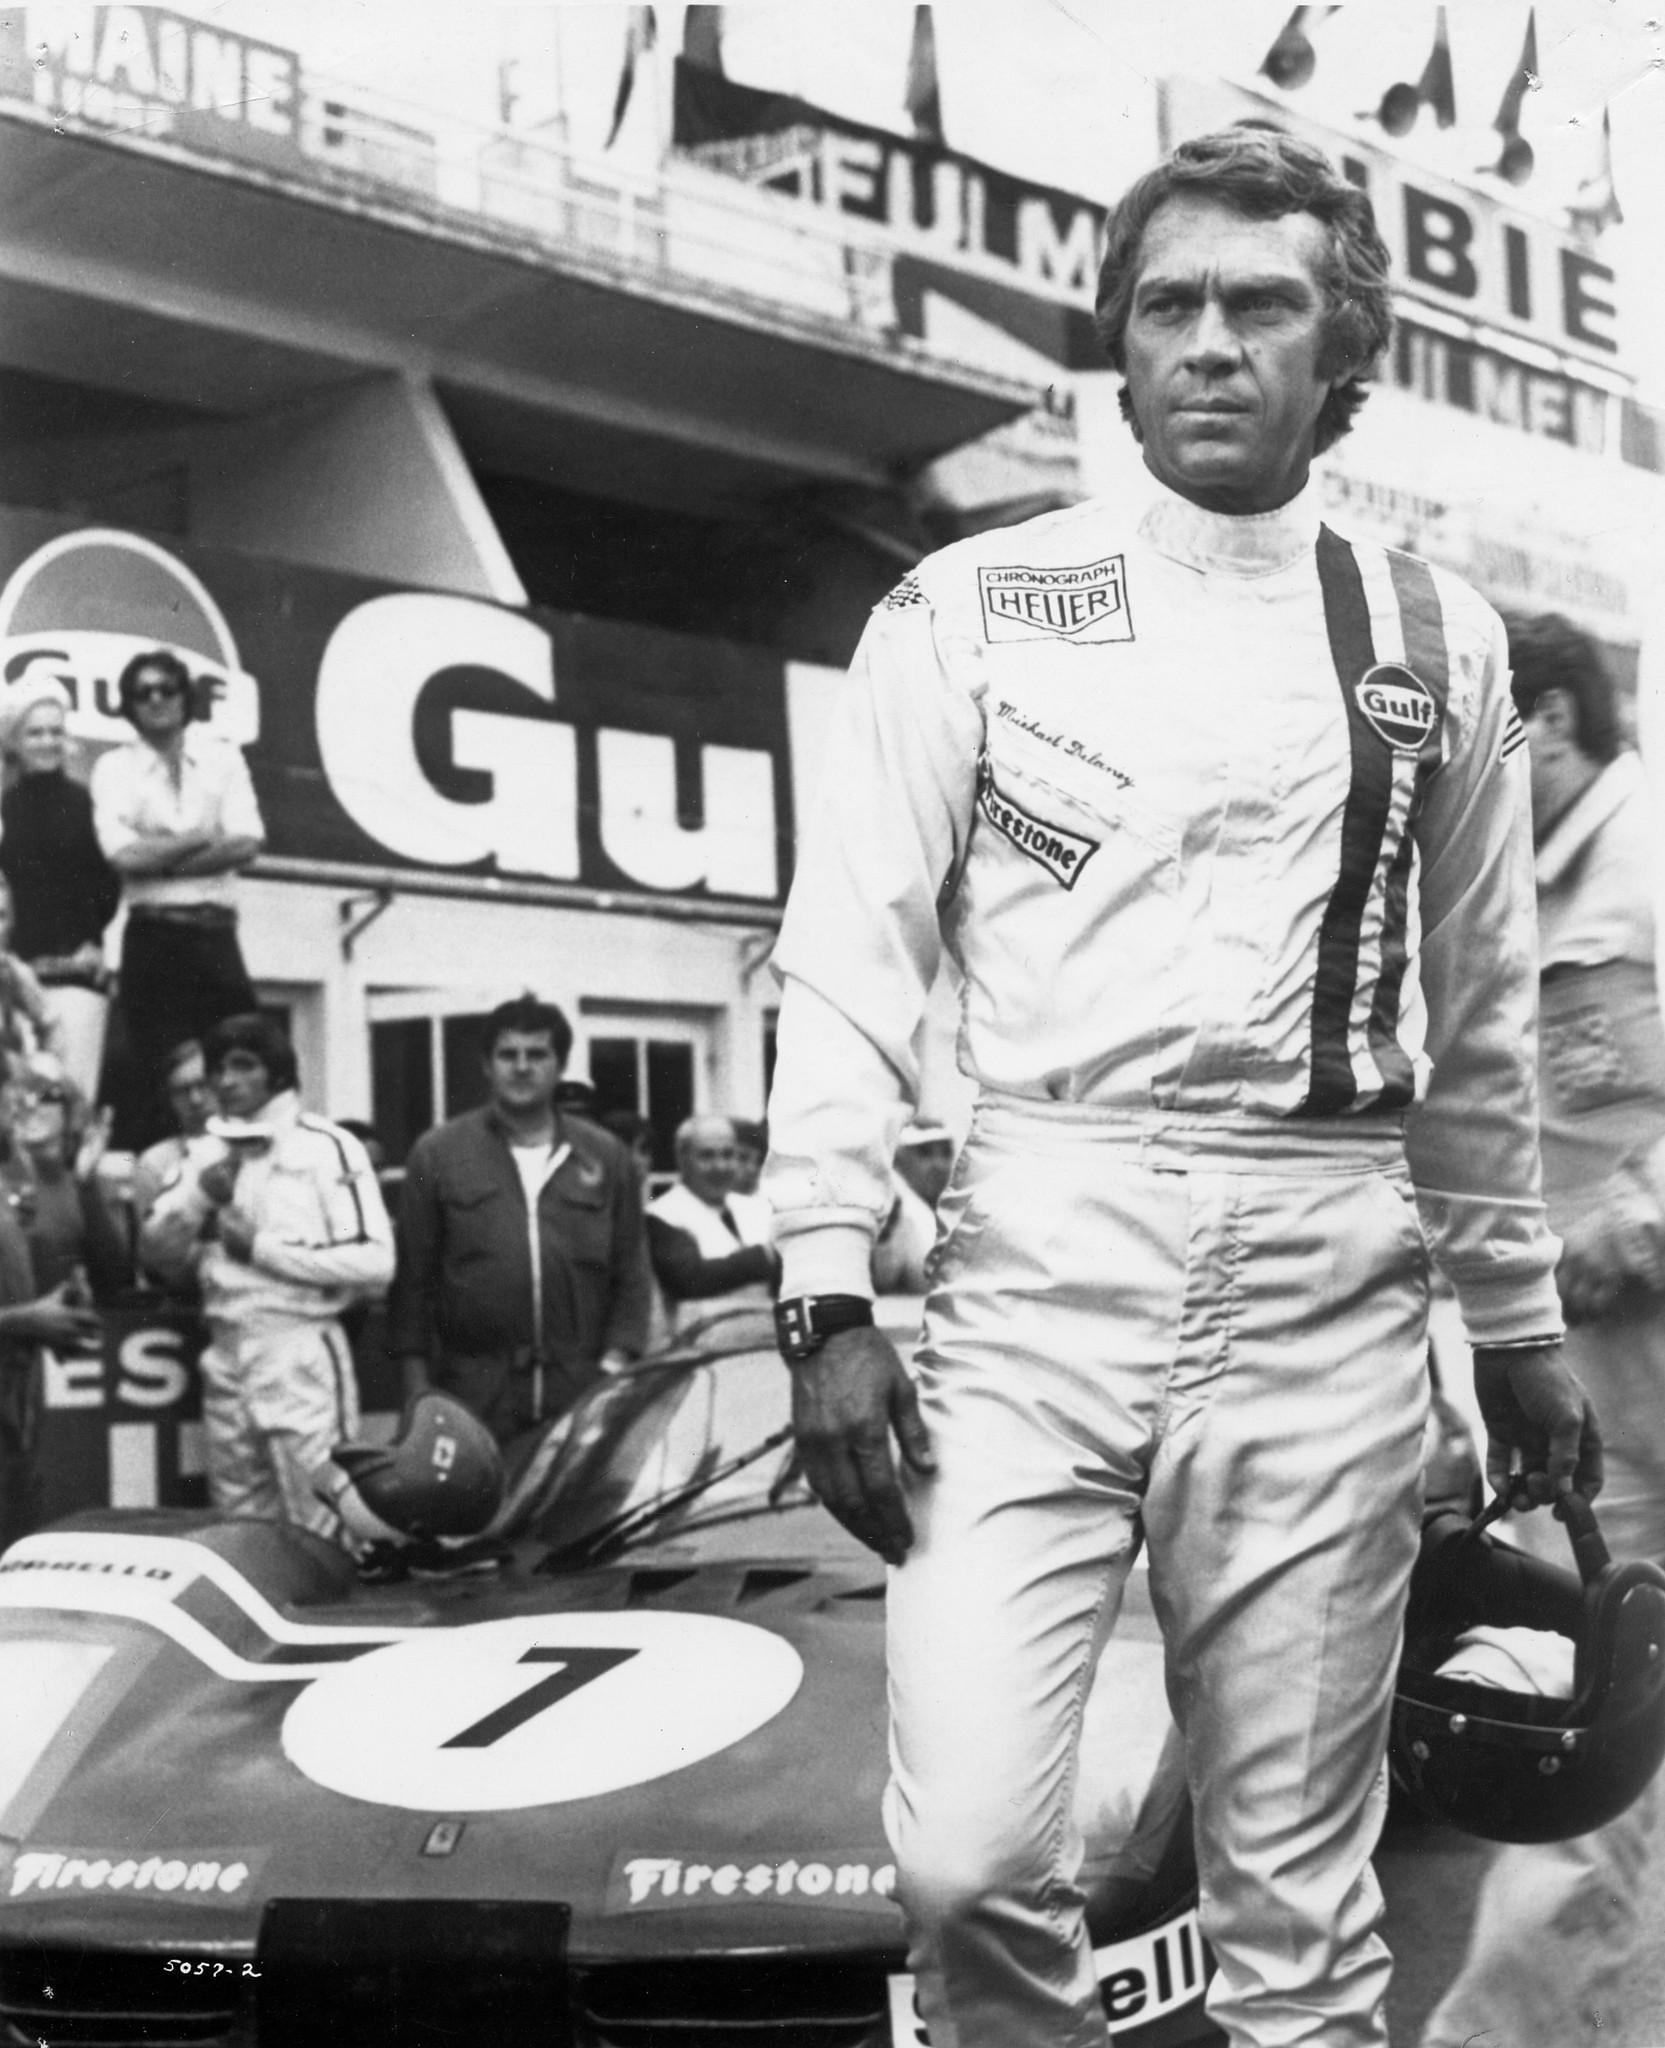 Steve McQueen on Le Mans race track with Heuer Monaco watch on.